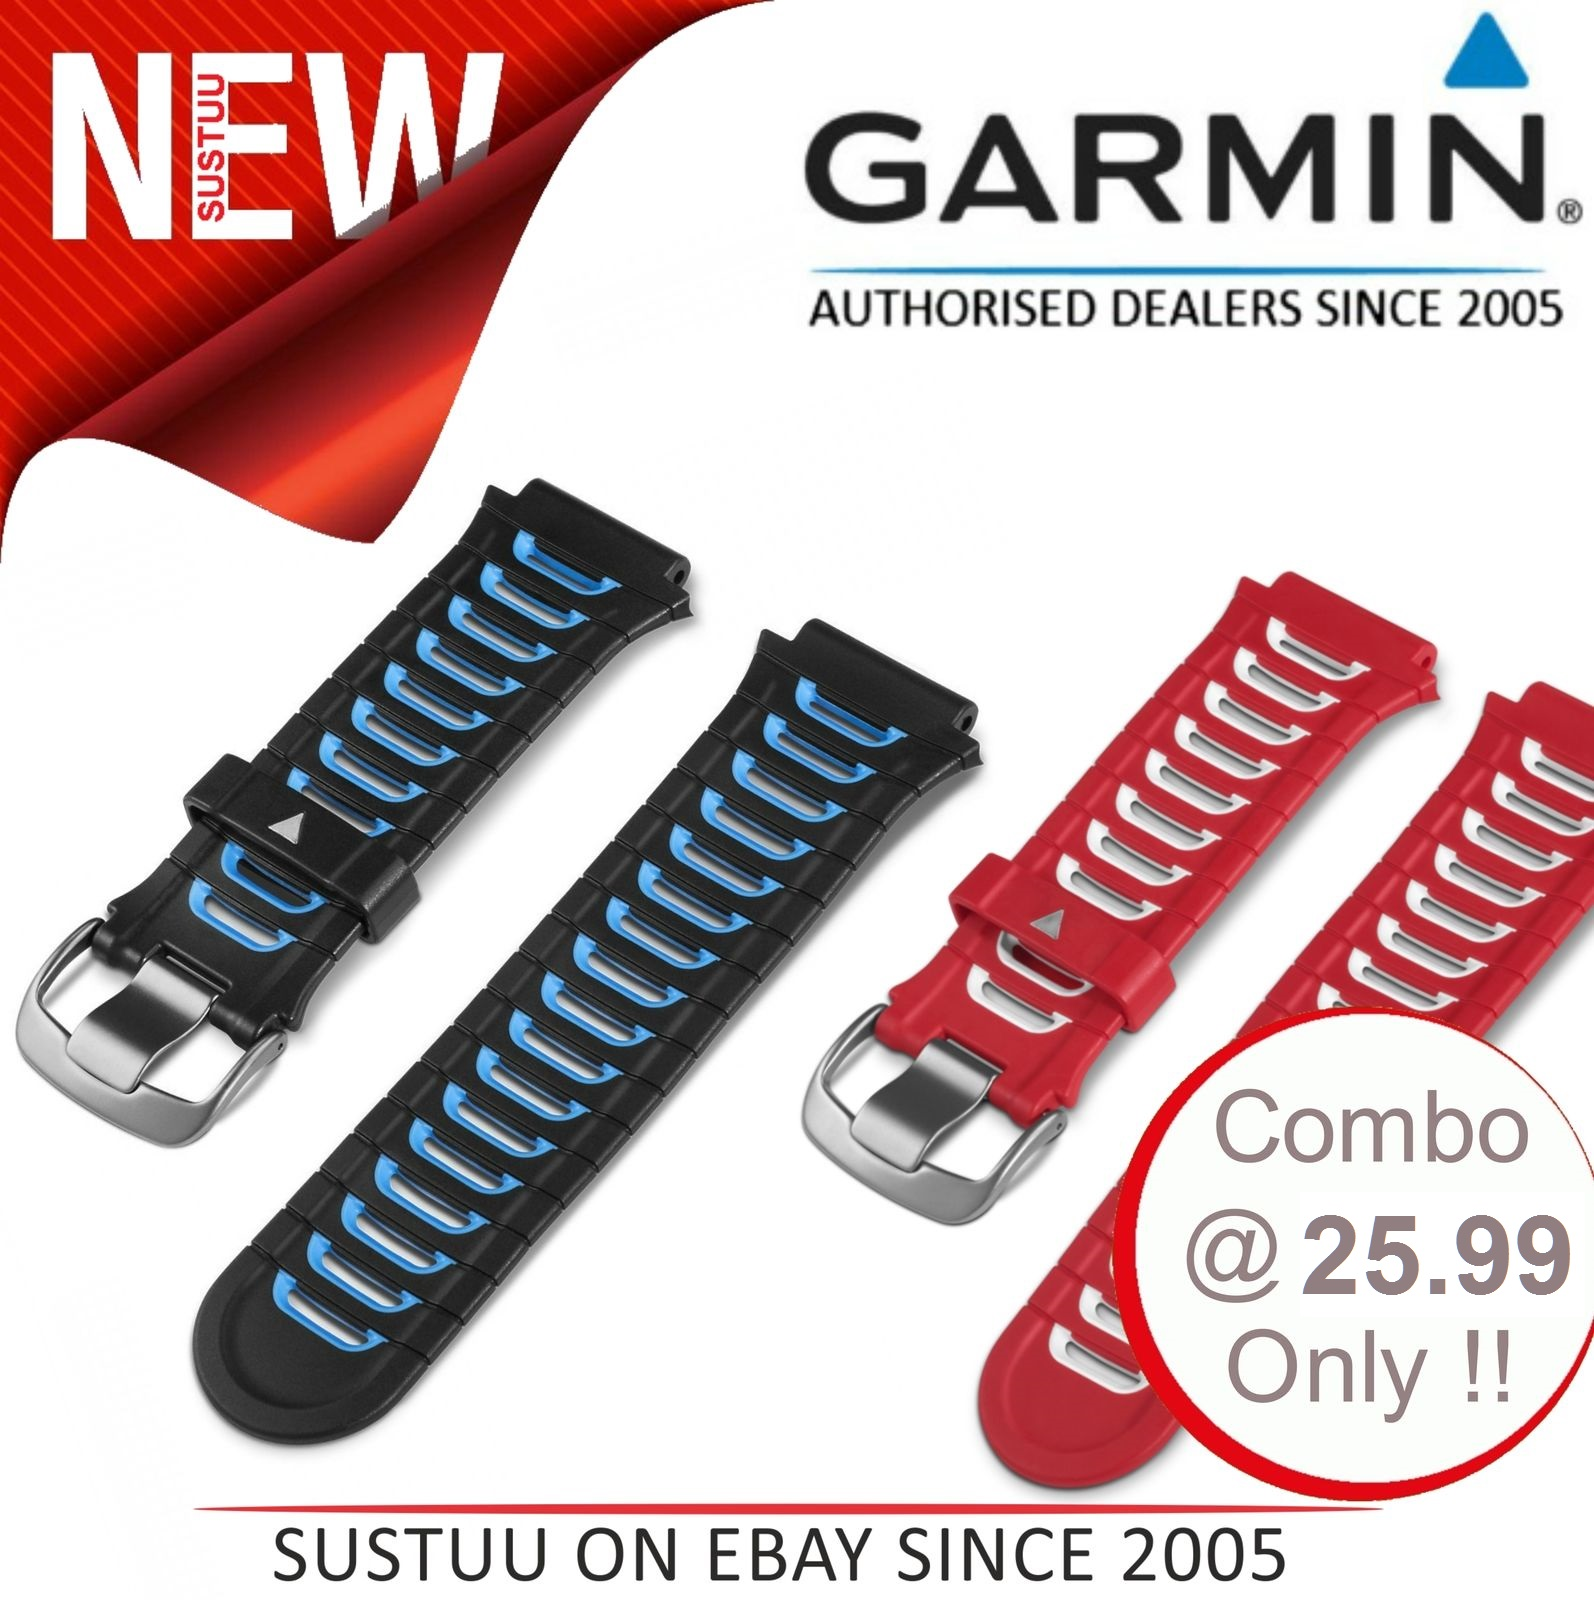 Garmin 010-11251-42|Replacement GPS Watch Band Strap|Forerunner 920XT x 2Color